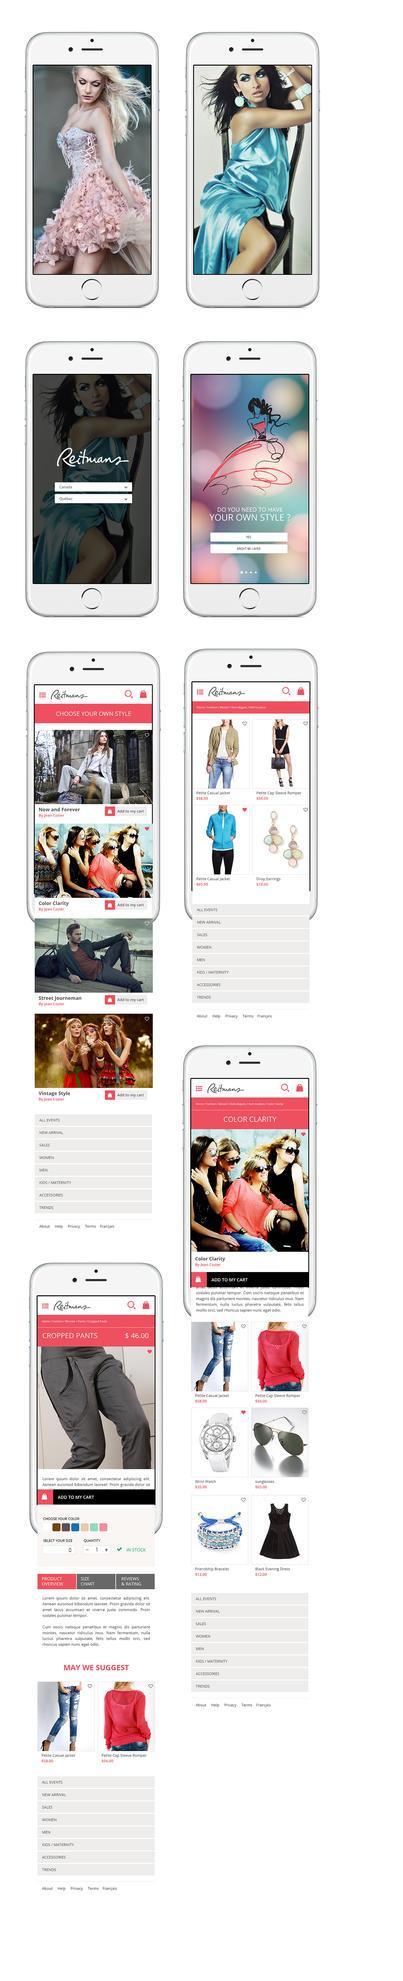 Reitmans App IOS by Webdesignerps